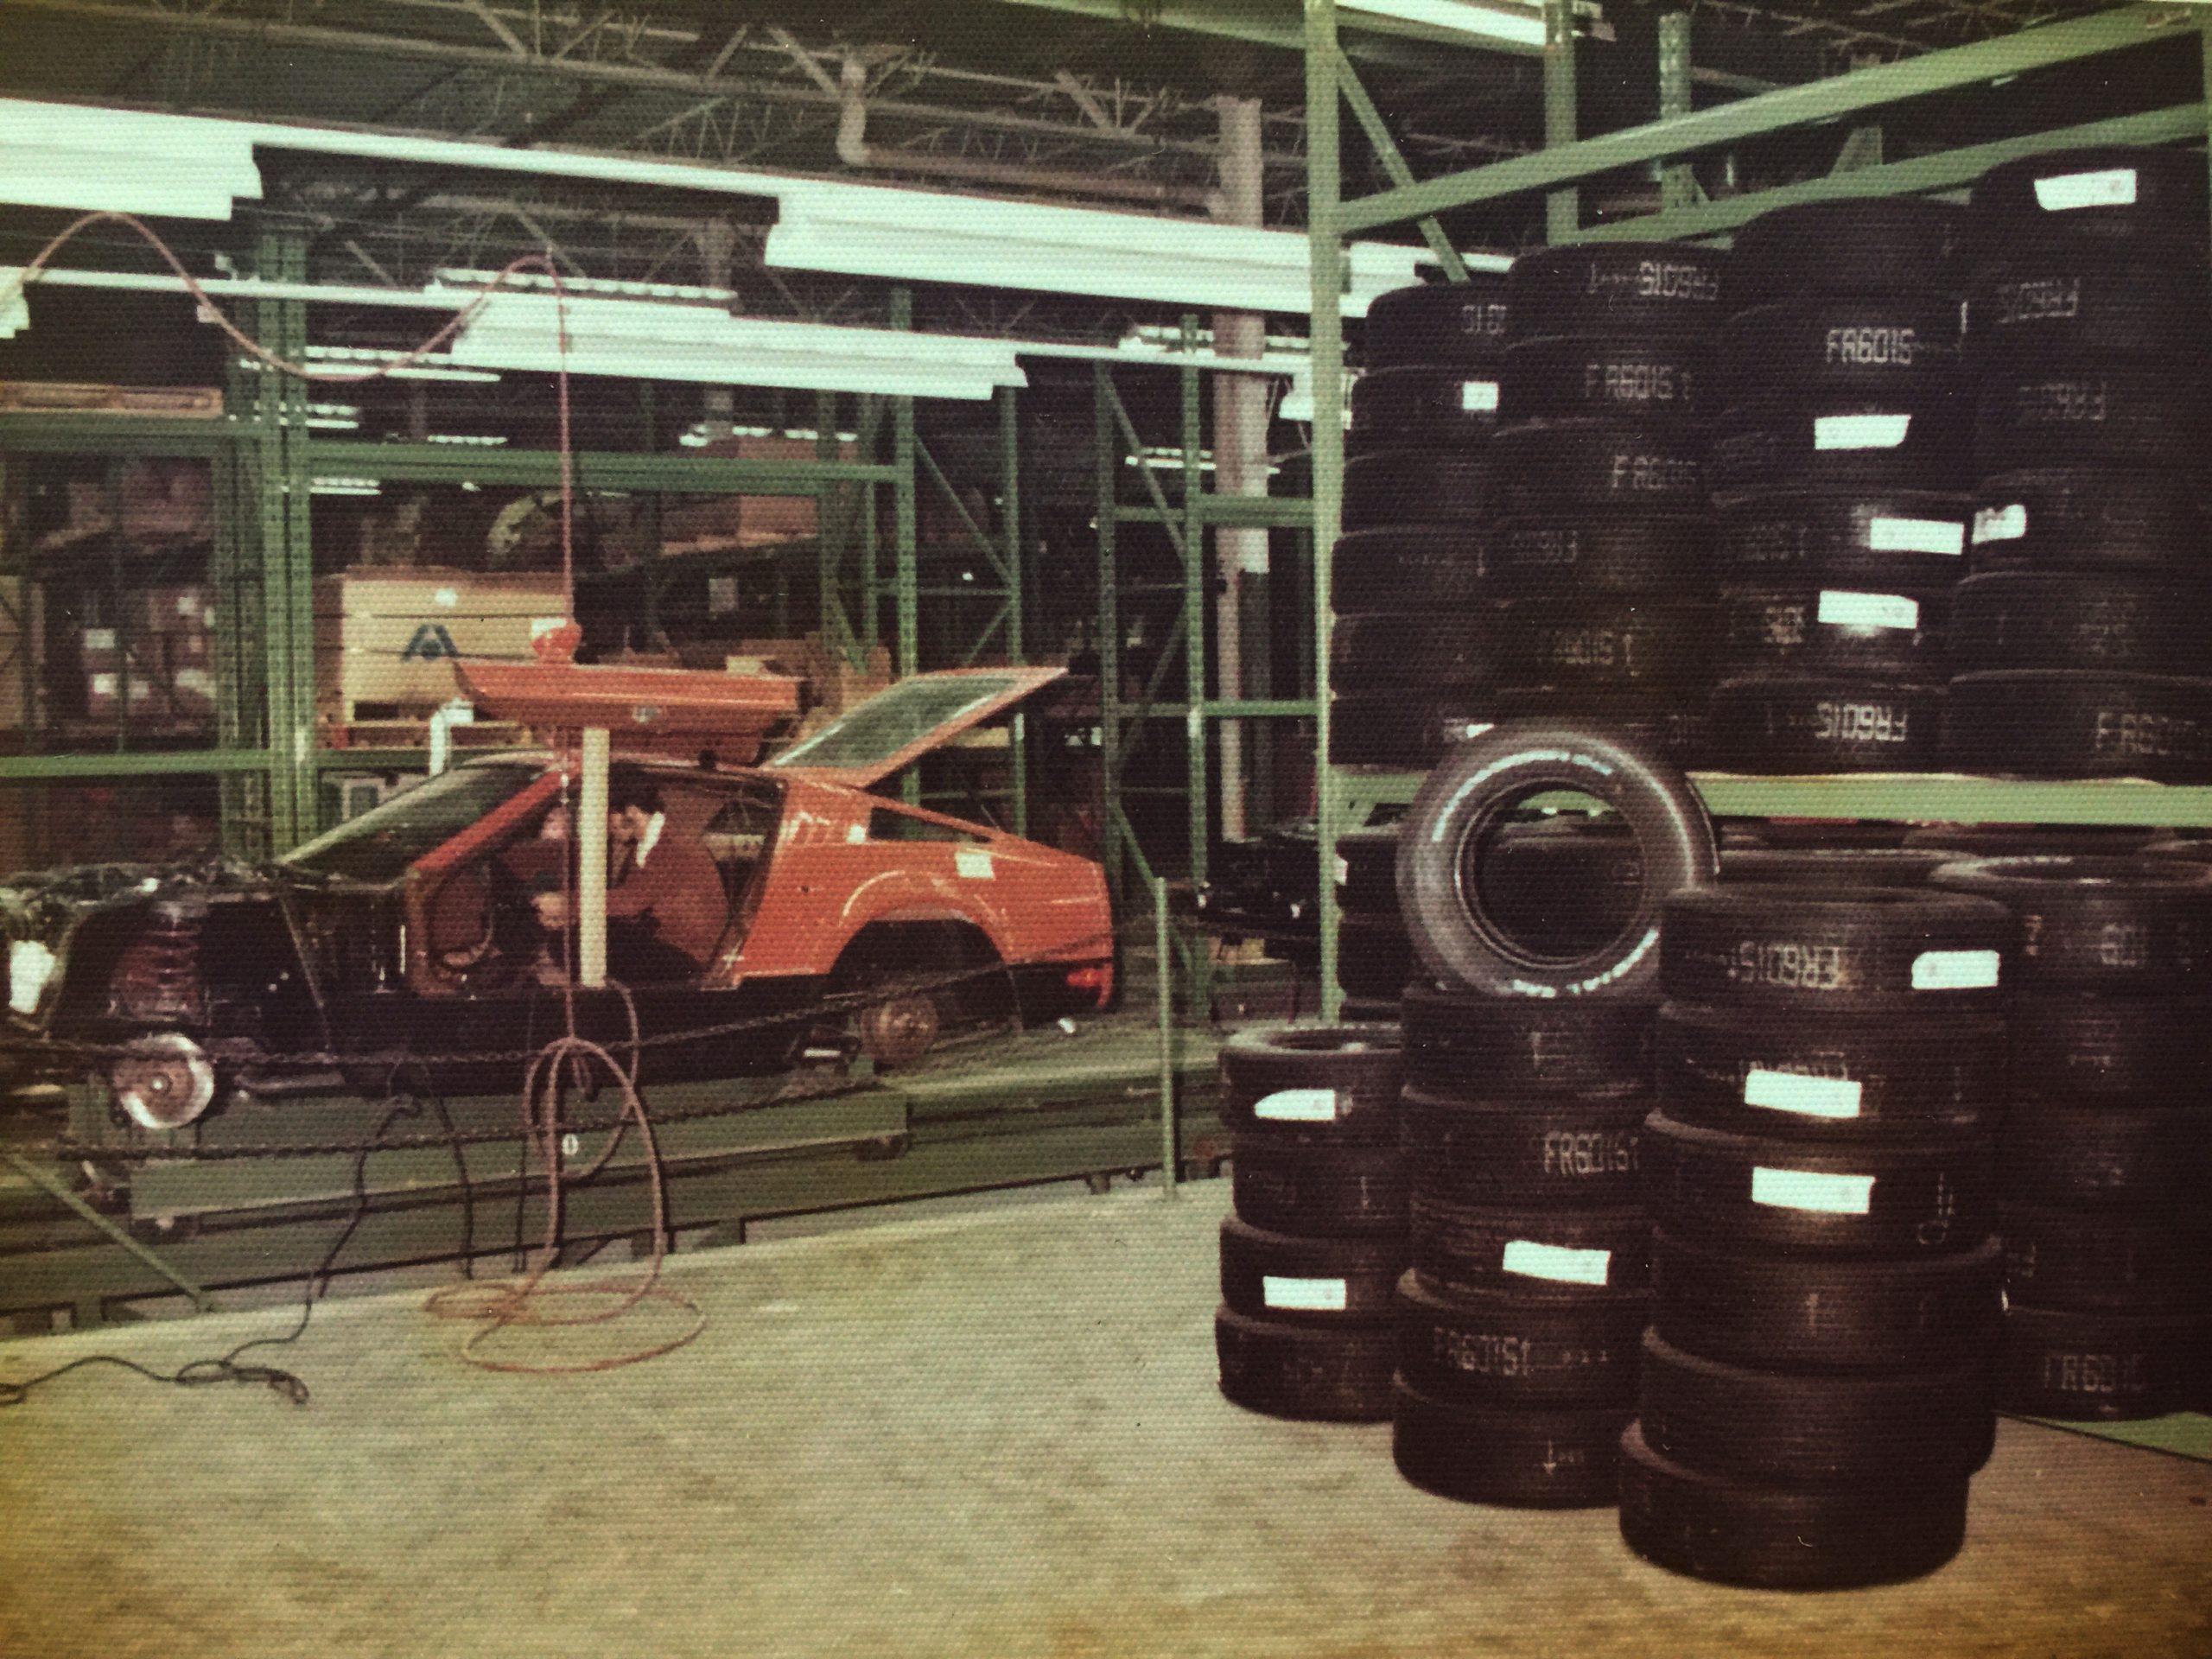 bricklin sv-1 assembly line beside tires